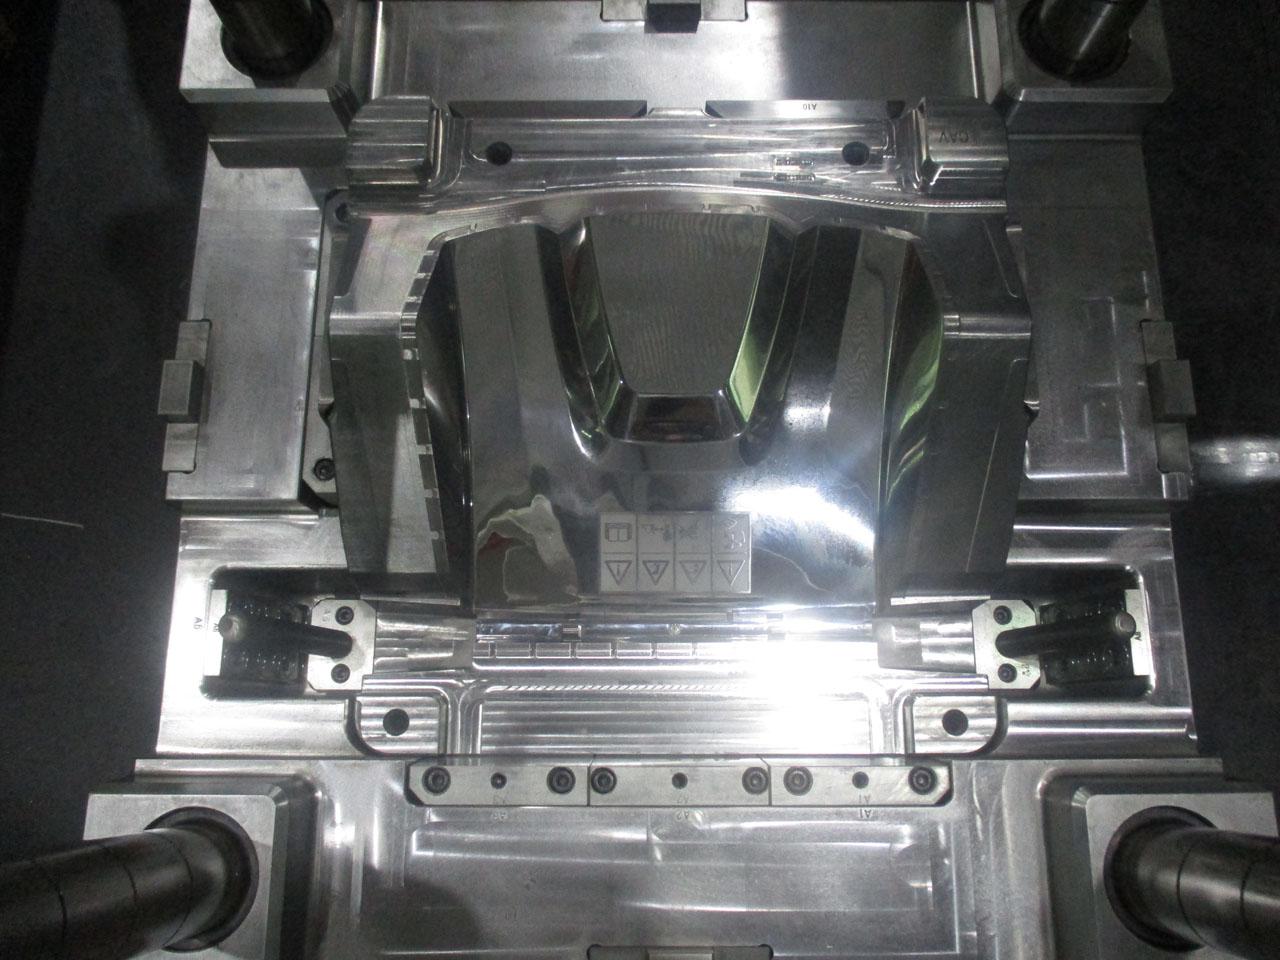 Weeder casing